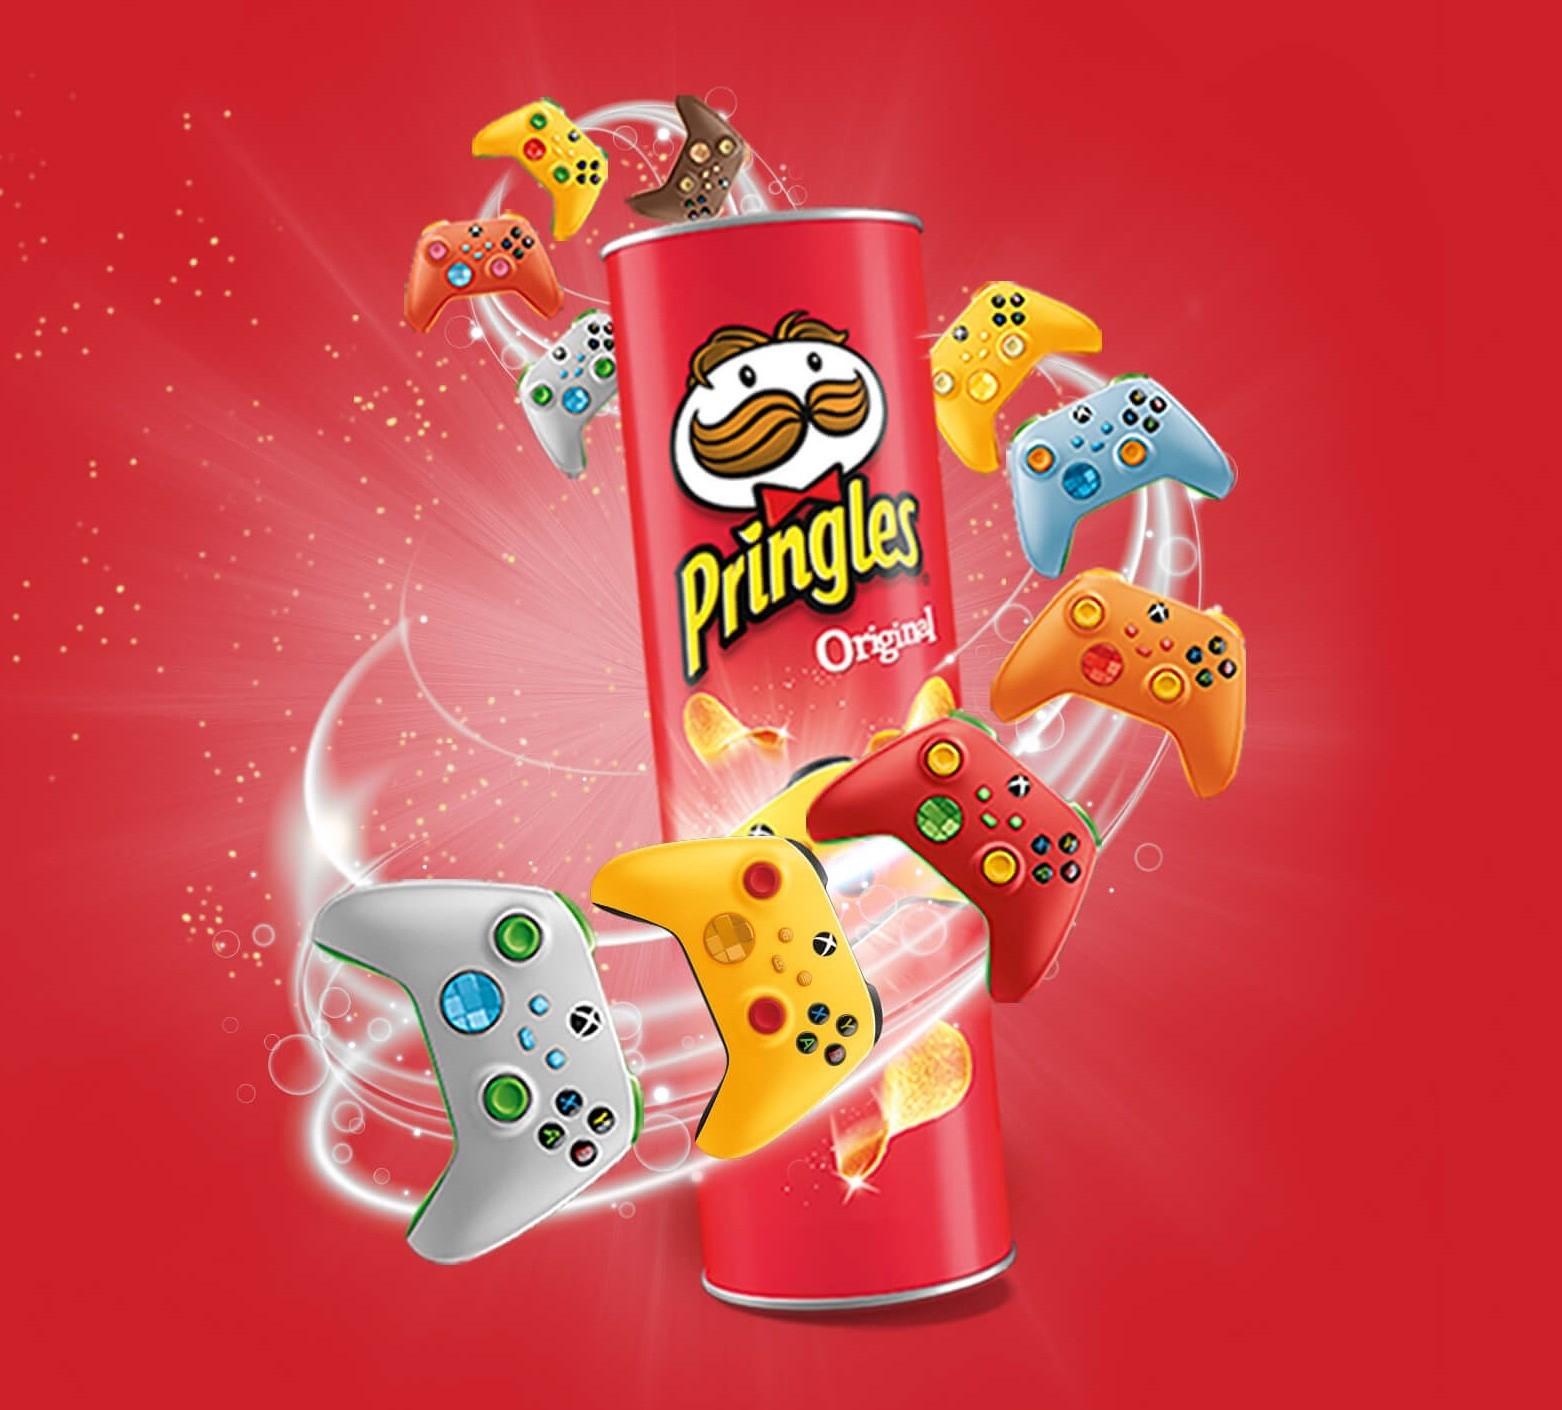 7 días de Xbox Game Pass Ultimate por una lata de Pringles